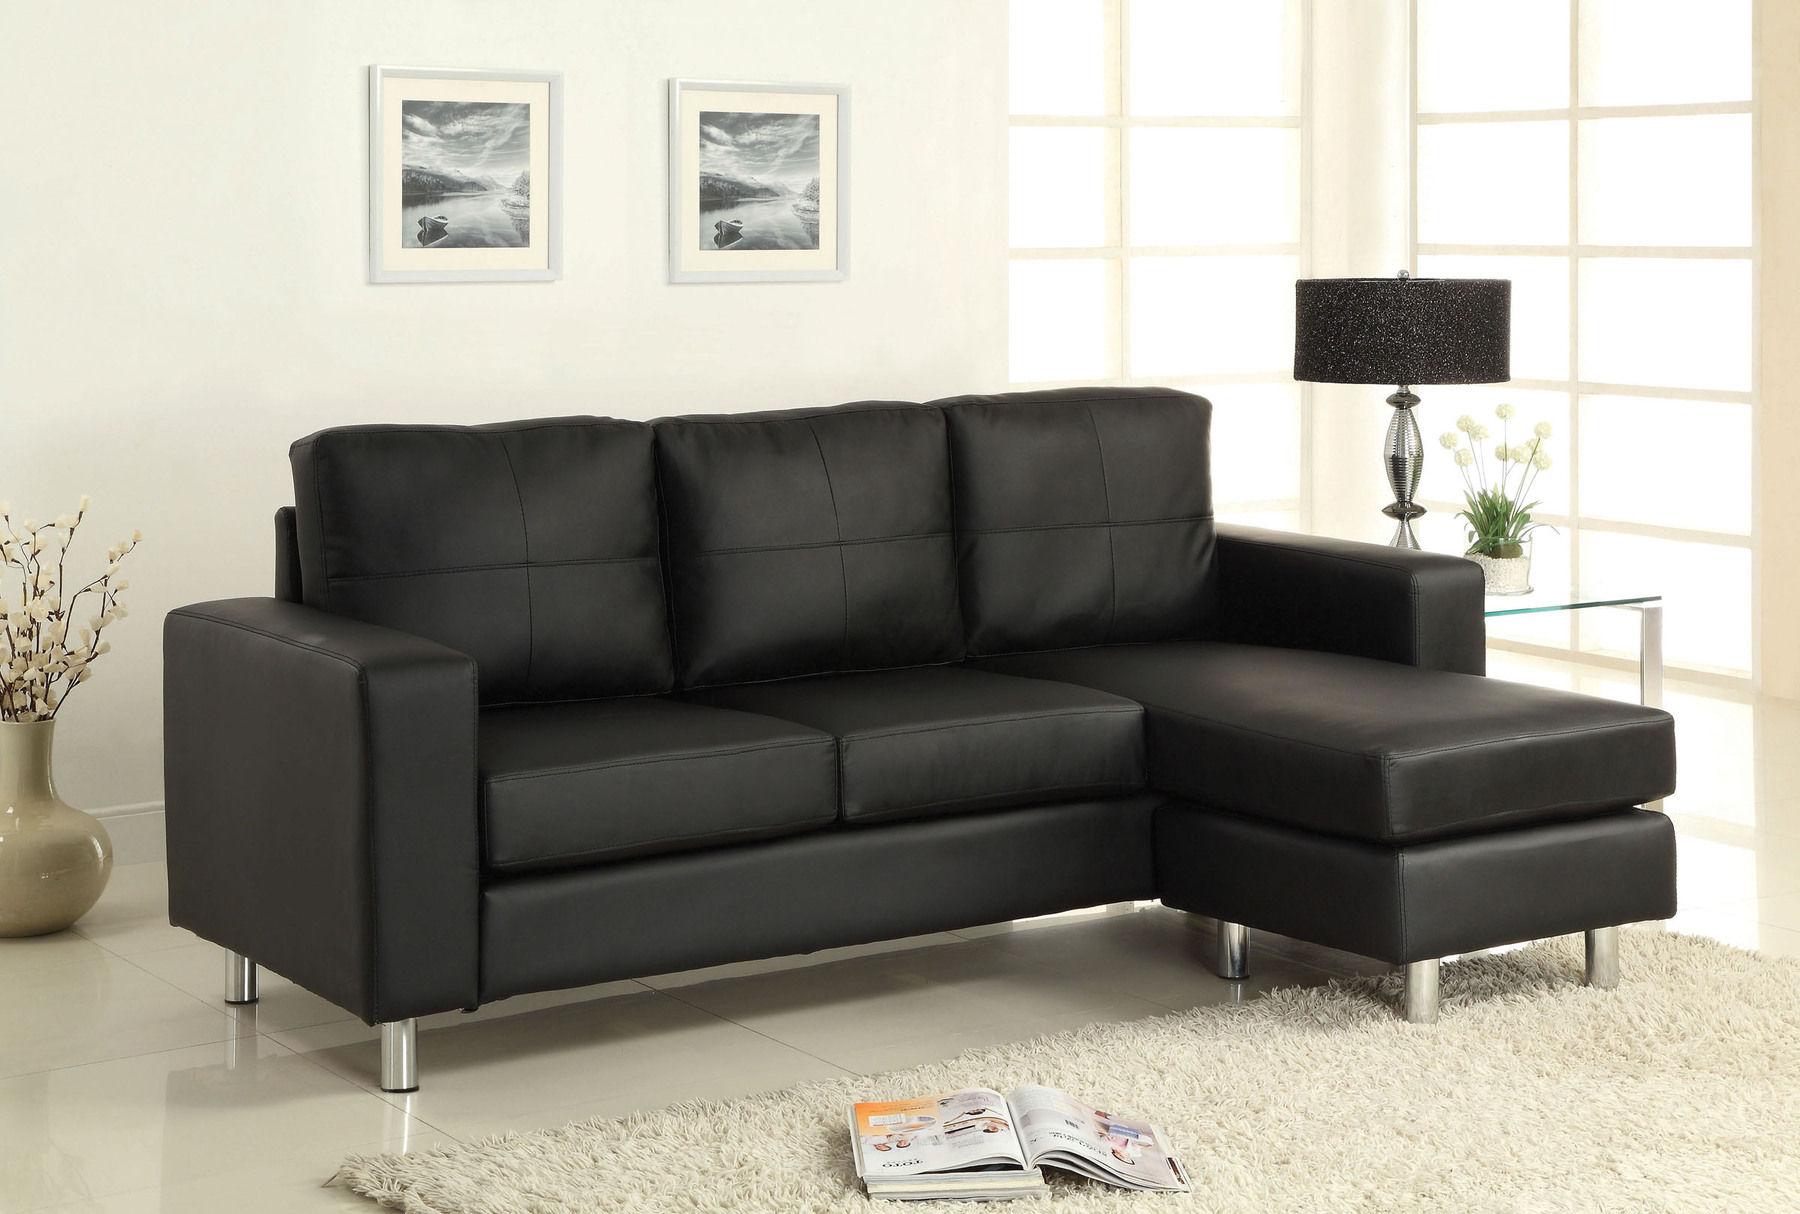 Sensational Avon Black Sectional Sofa Theyellowbook Wood Chair Design Ideas Theyellowbookinfo